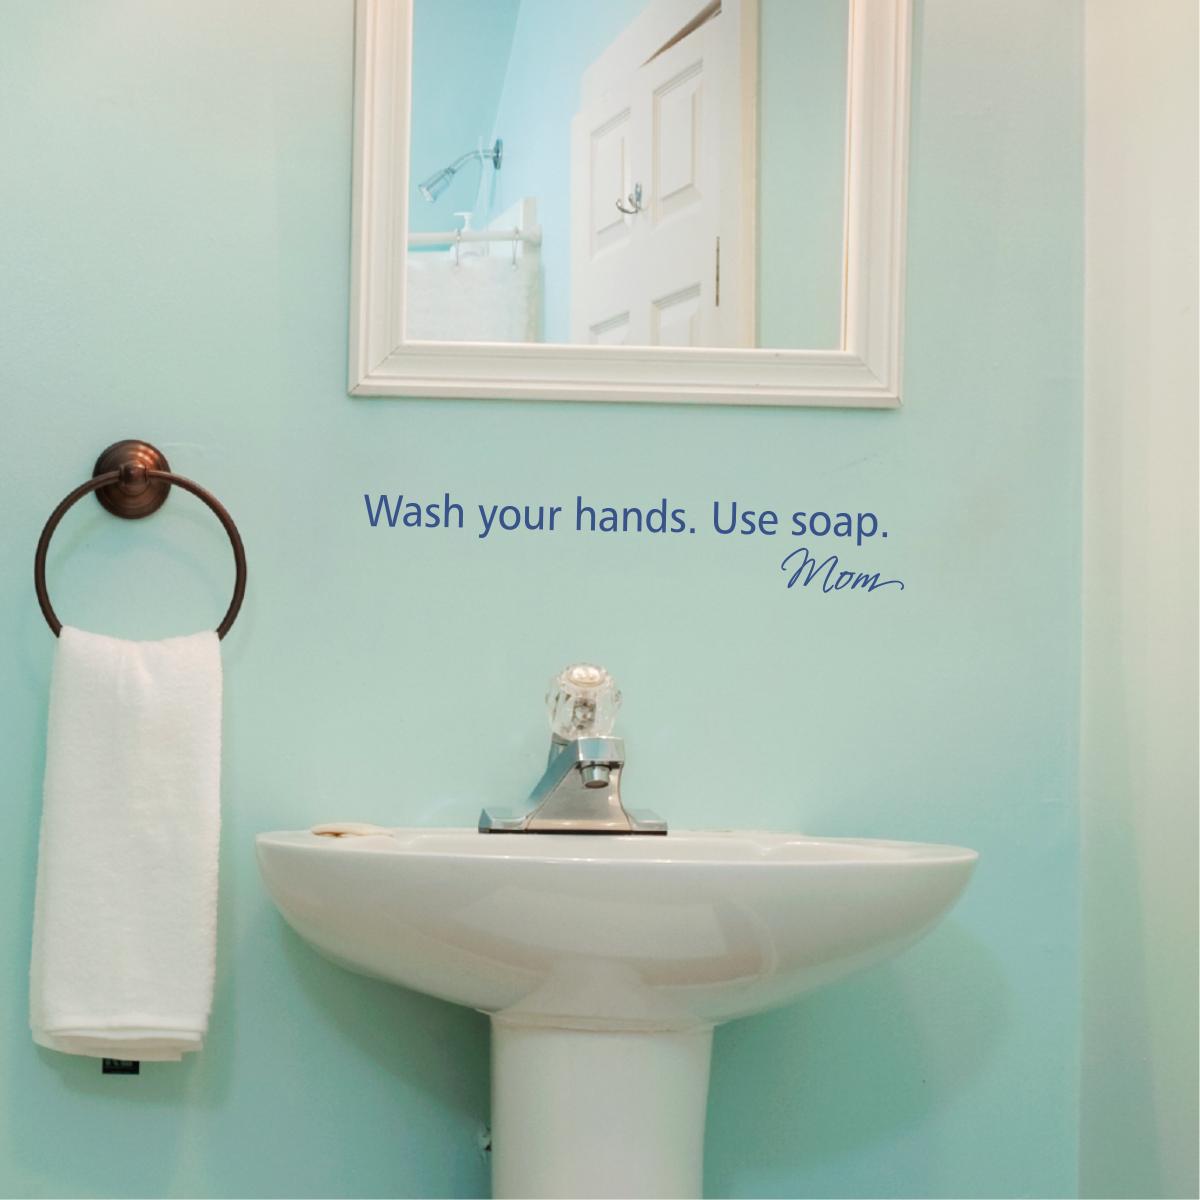 Bathroom Sink Quotes belvedere designs: bathroom inspiration